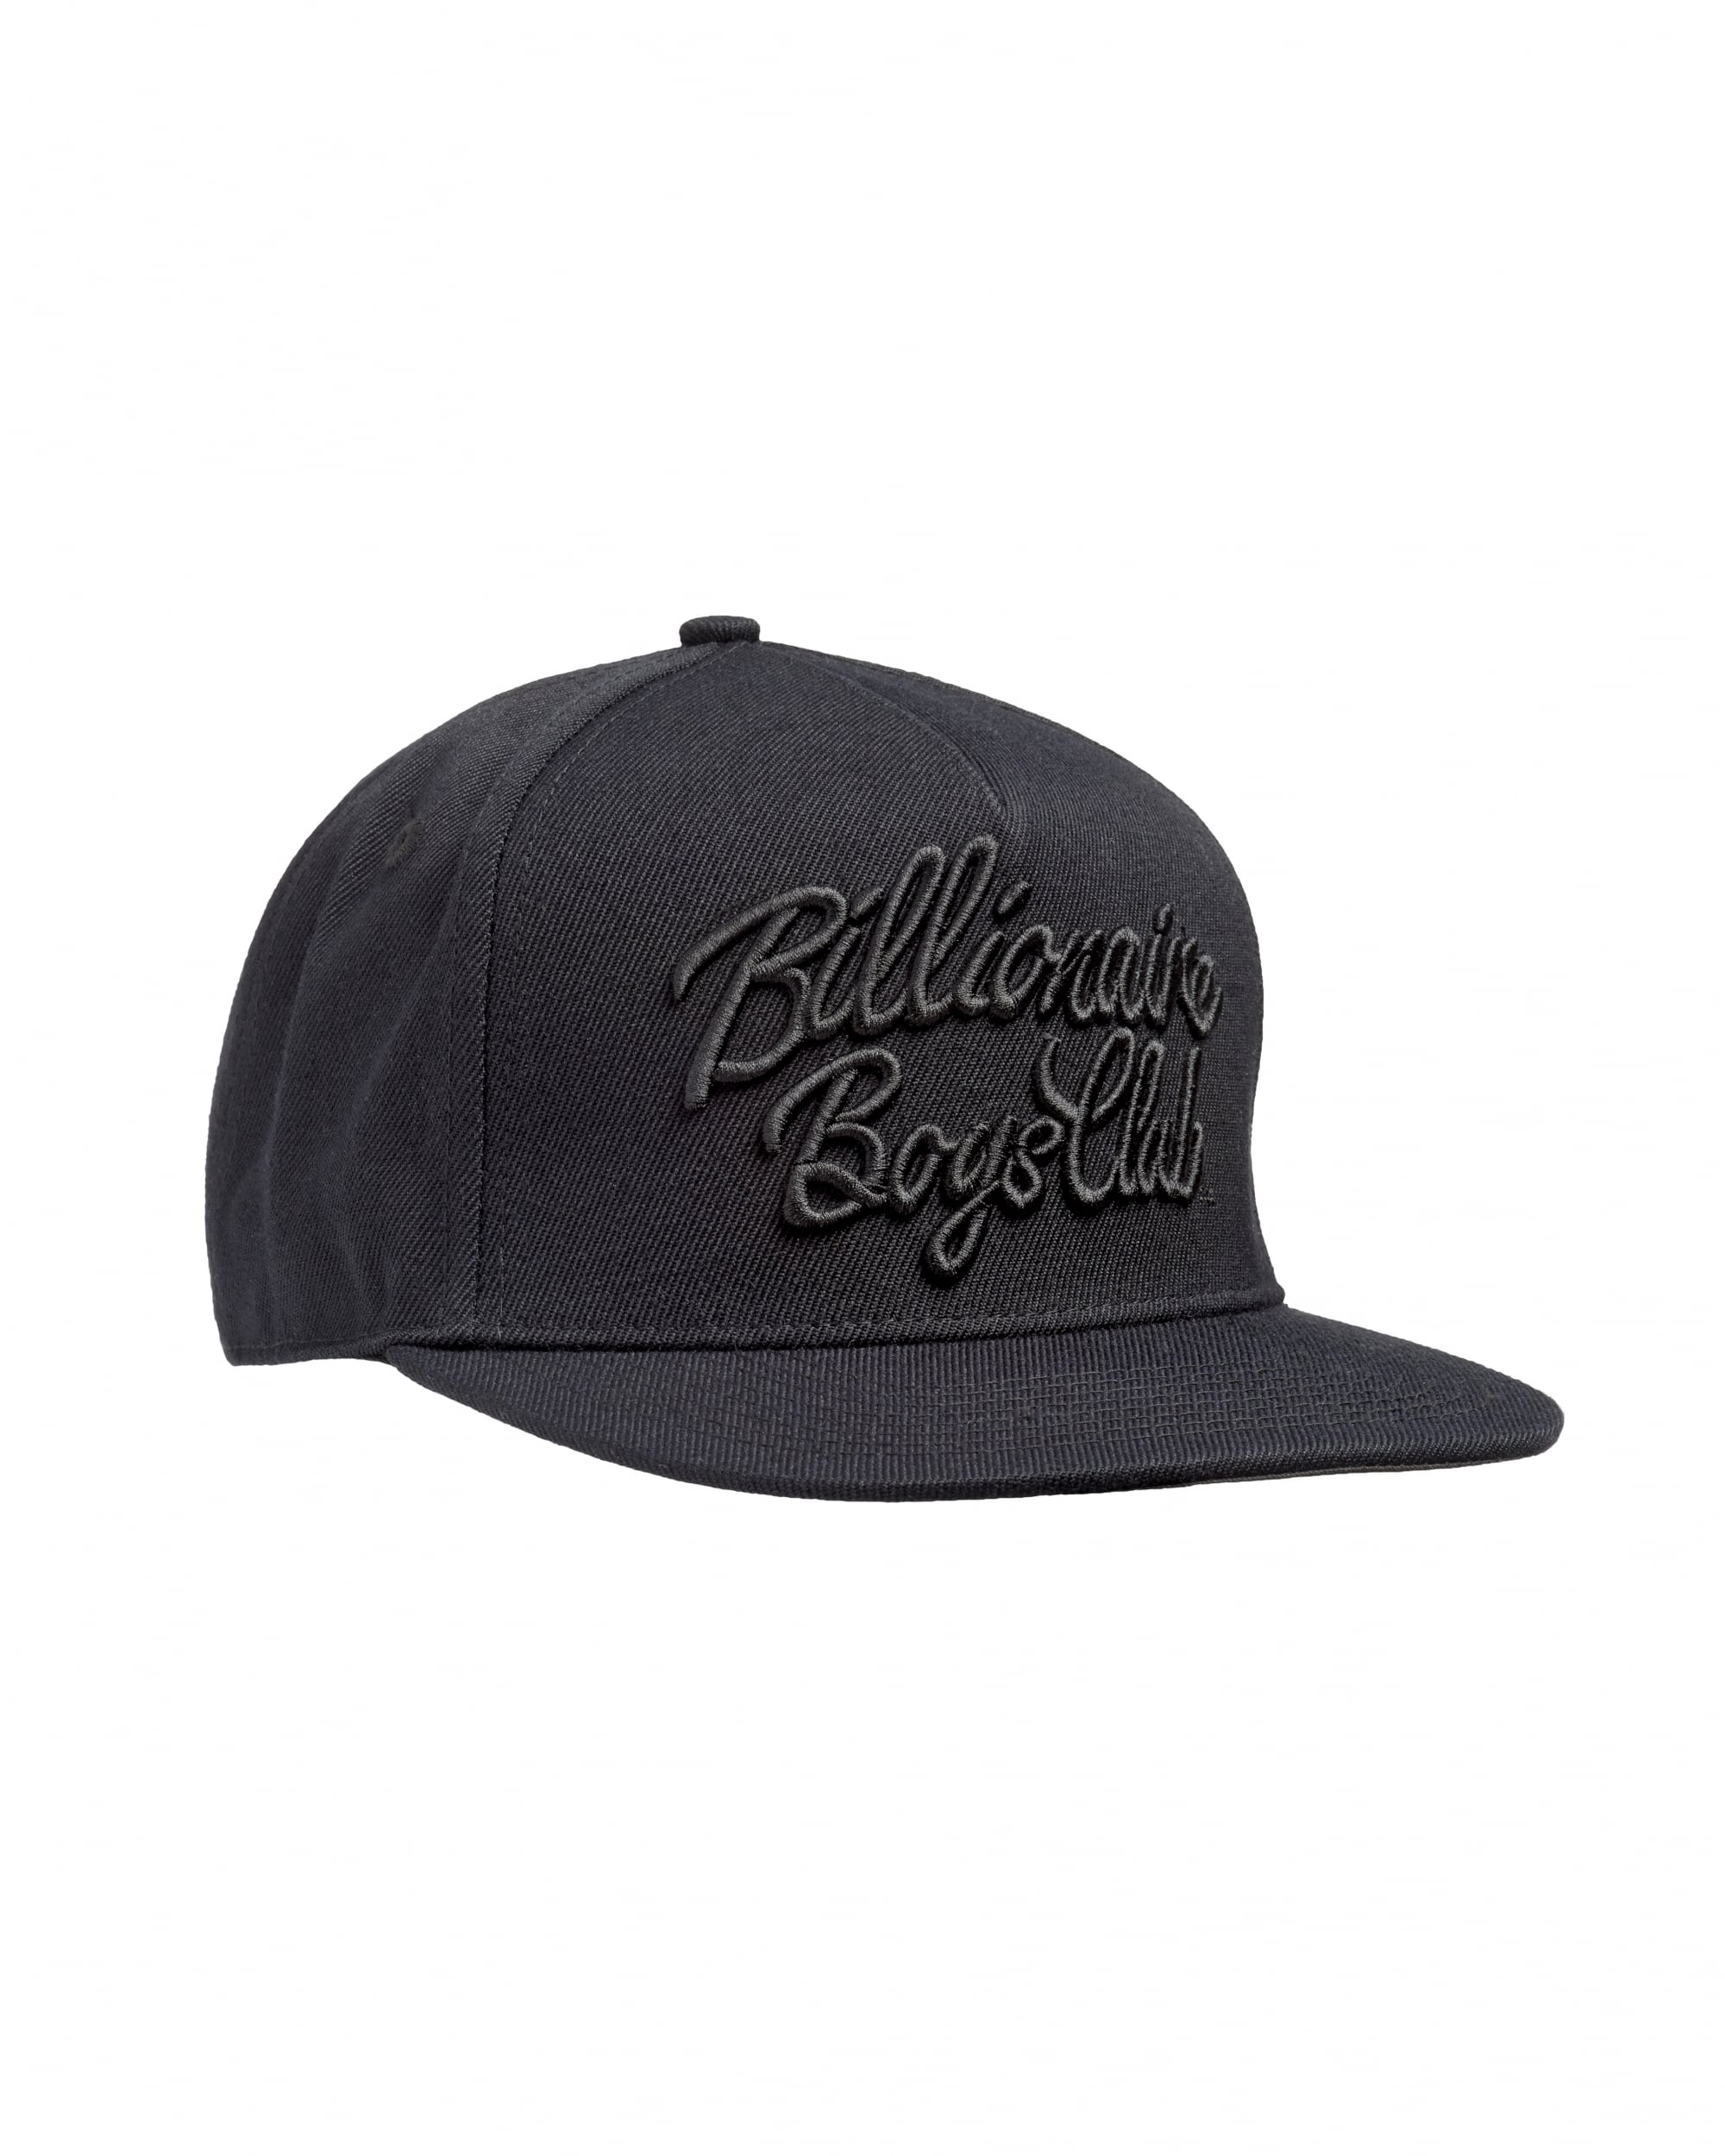 embroidered logo baseball cap - Blue Billionaire Boys Club fqGcIfLVn